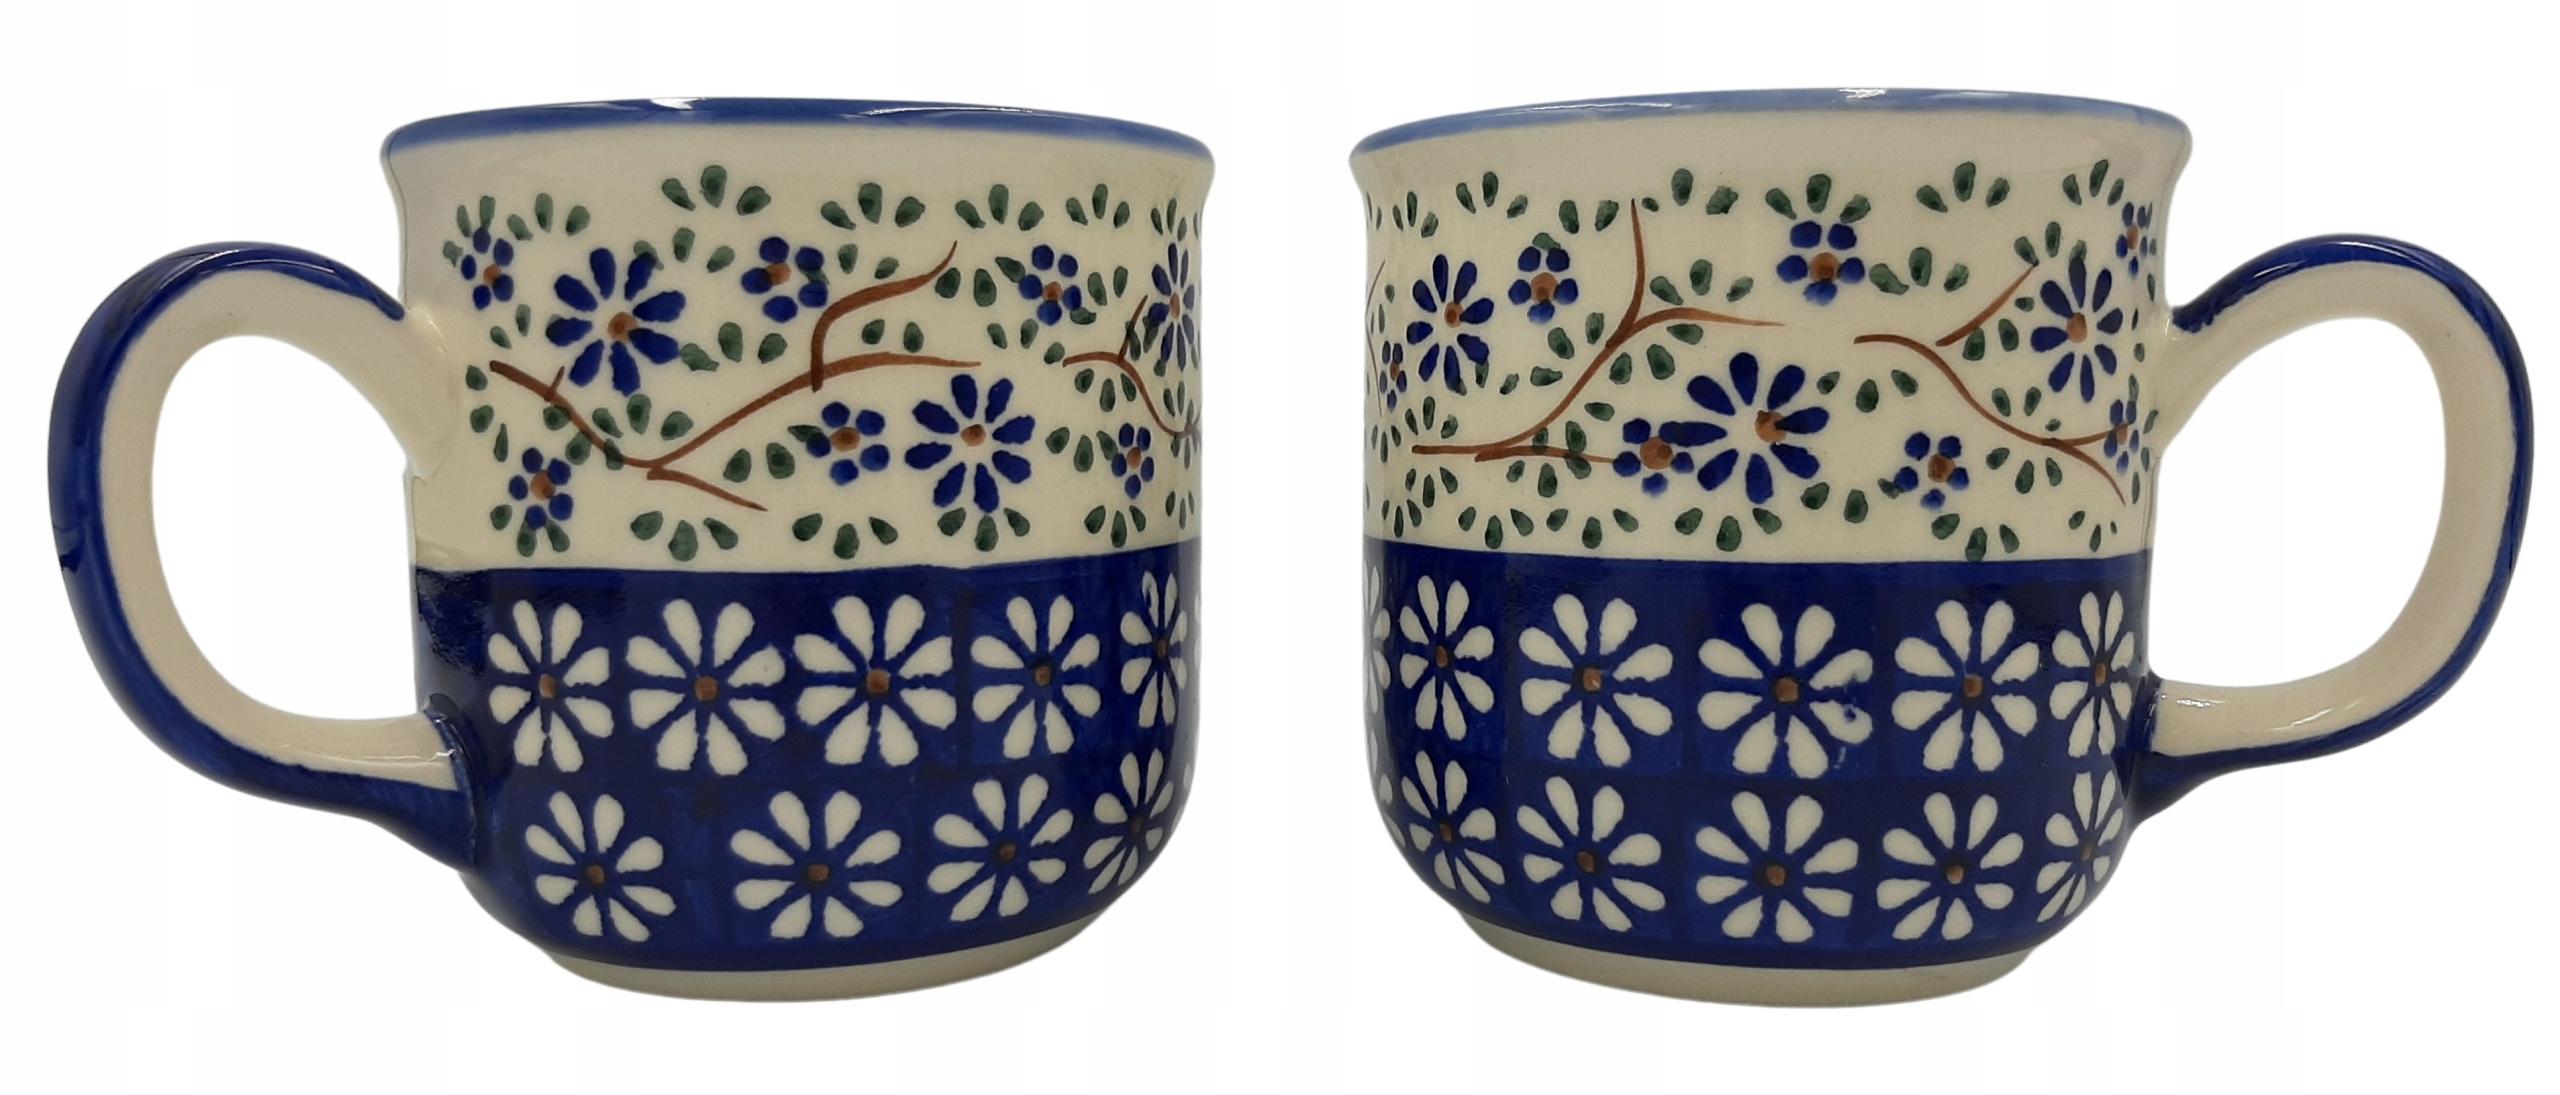 Ceramika Bolesławiec 2 стакана 250 мл